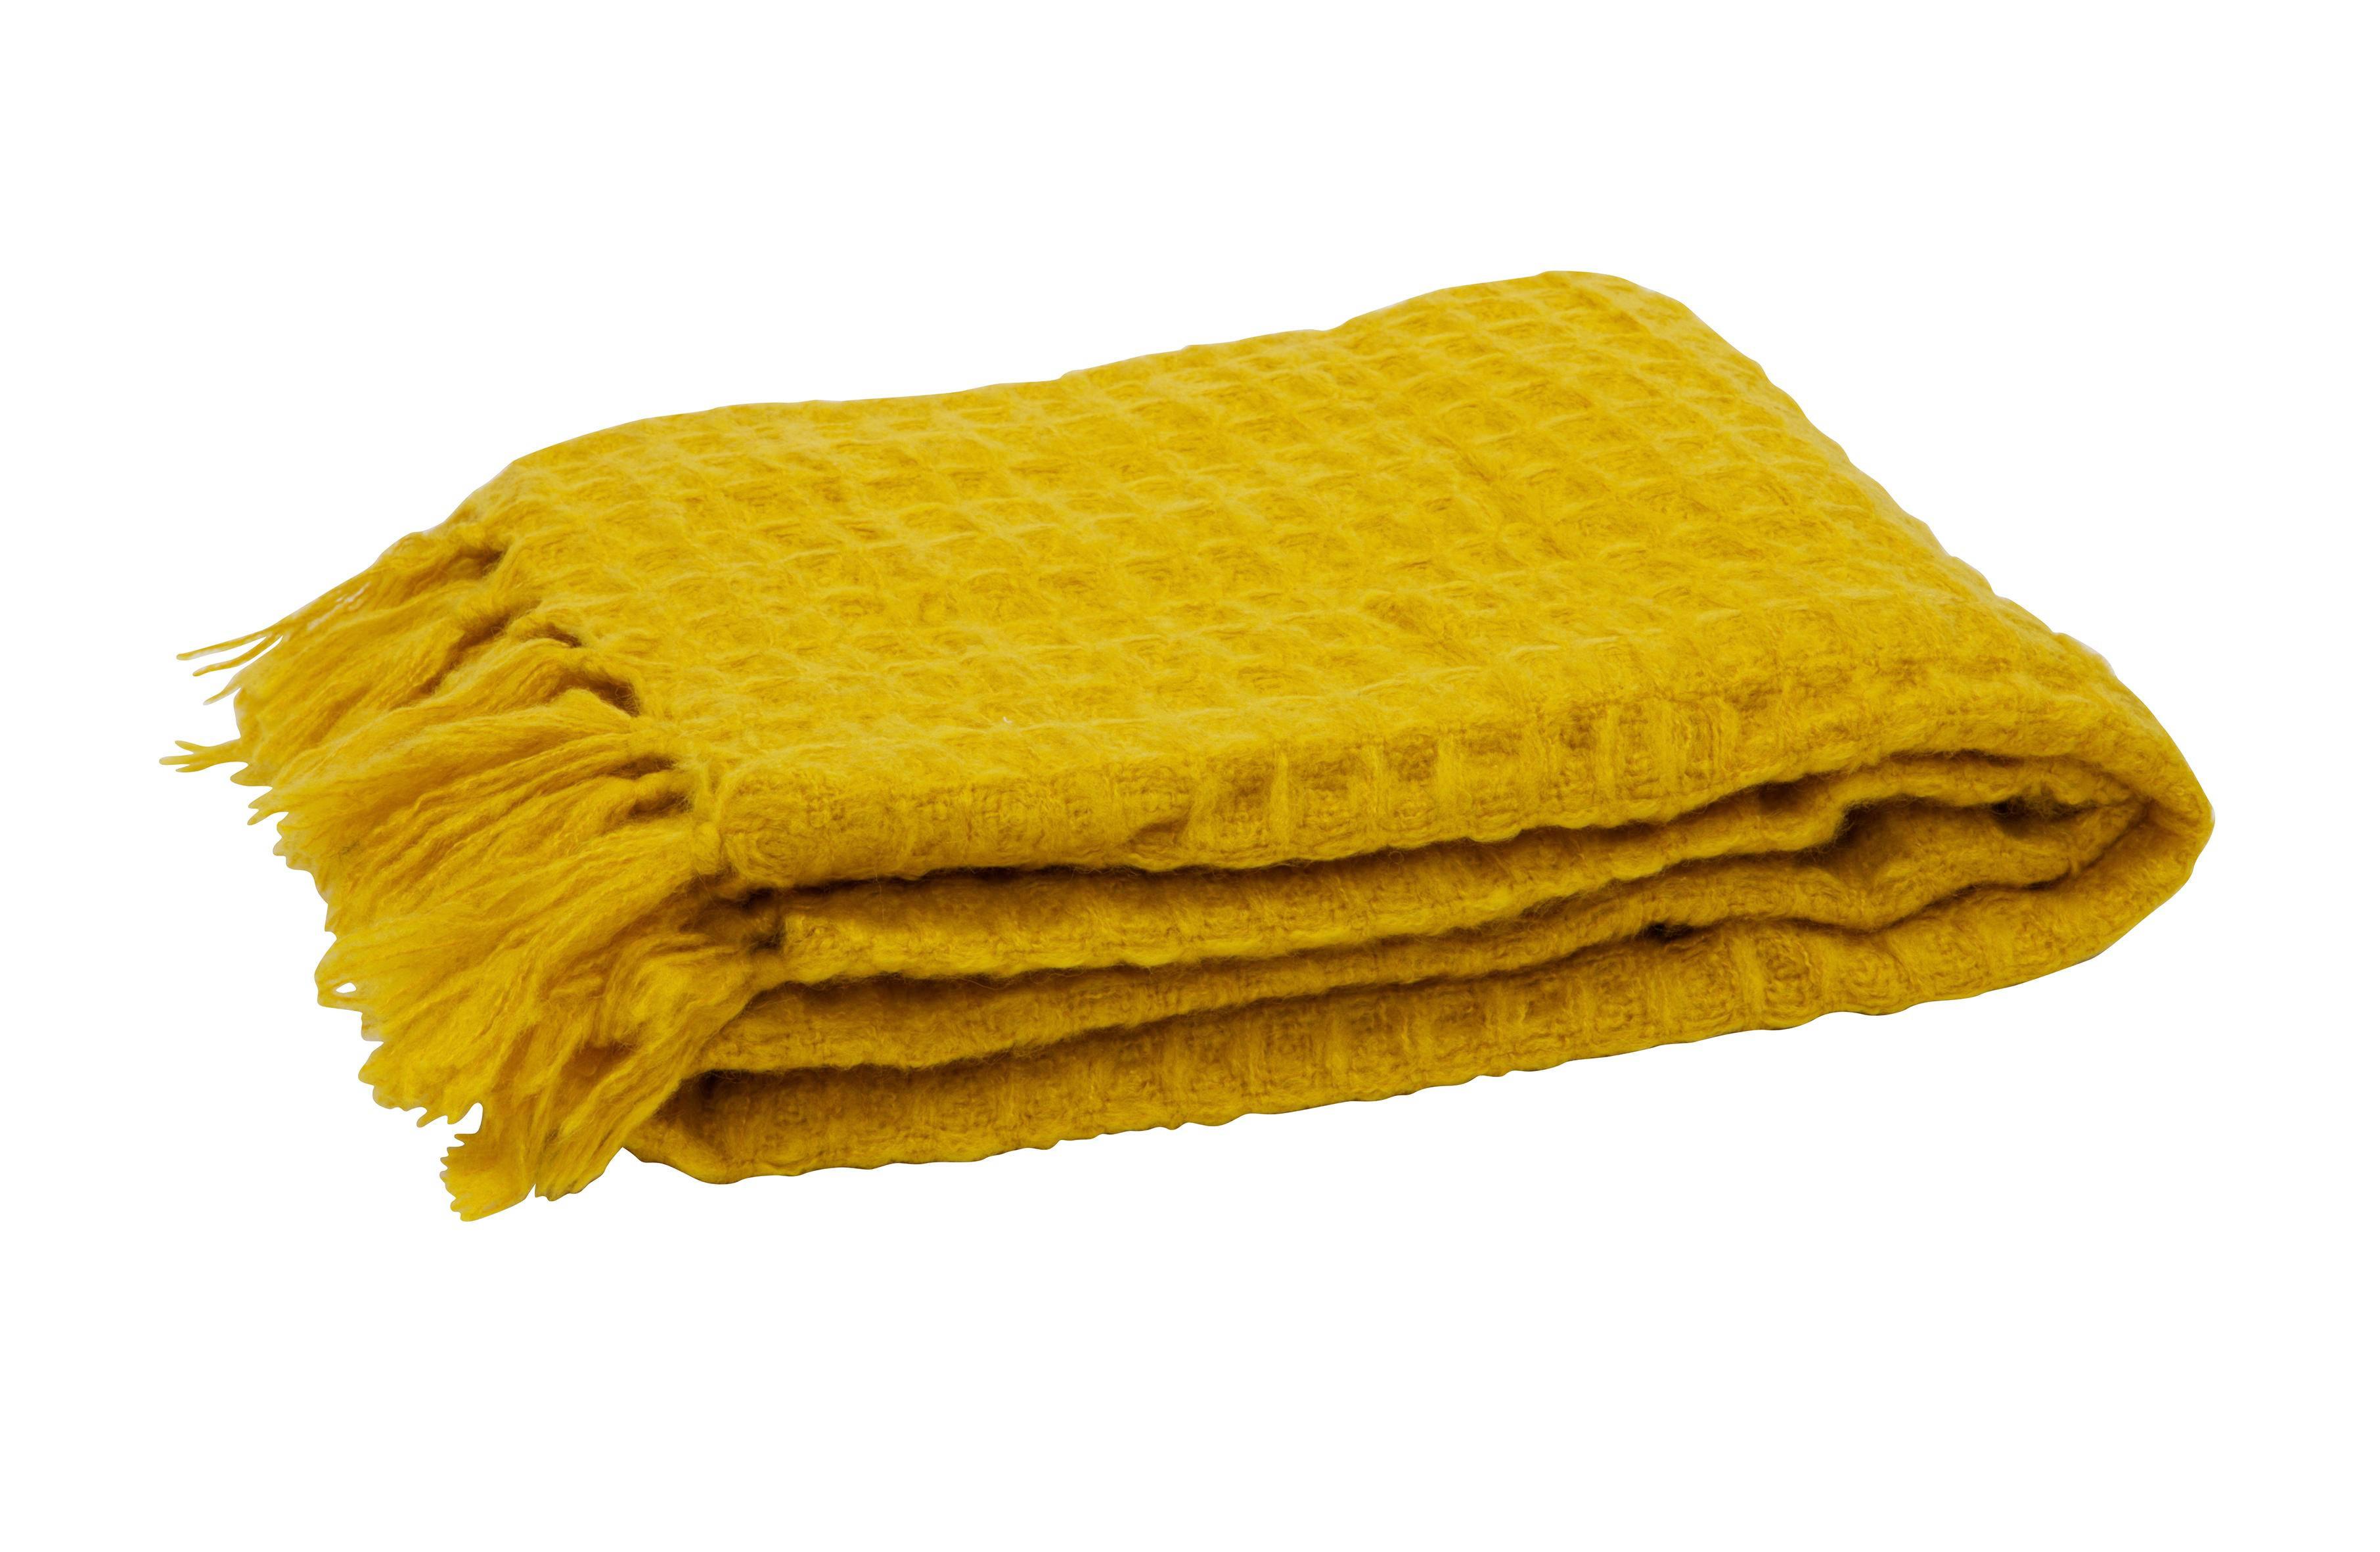 WOHNDECKE 130/170 cm Gelb - Gelb, Textil (130/170cm)